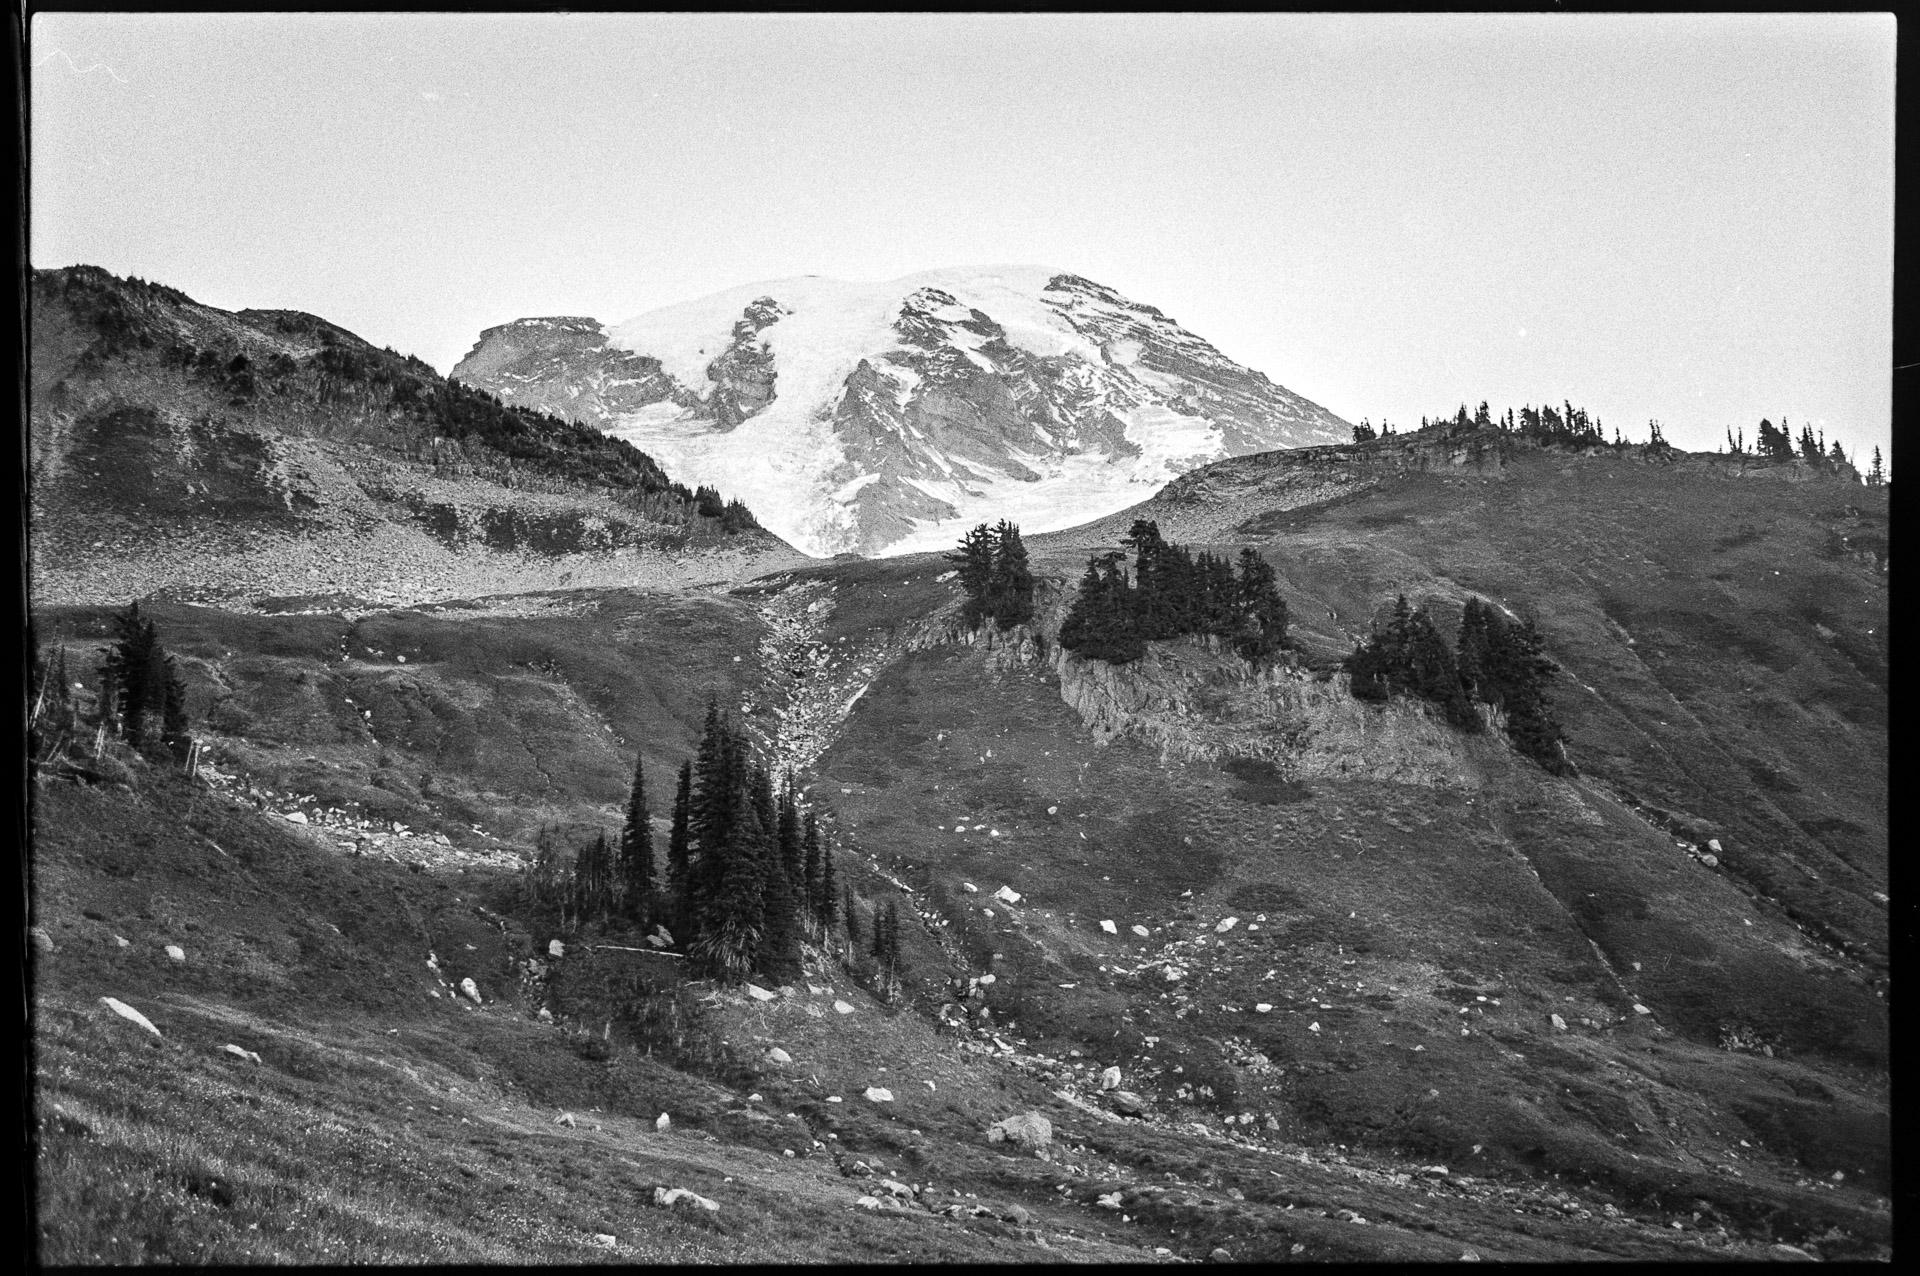 Walk Mt Ranier—Chris-Page-Art-7.jpg